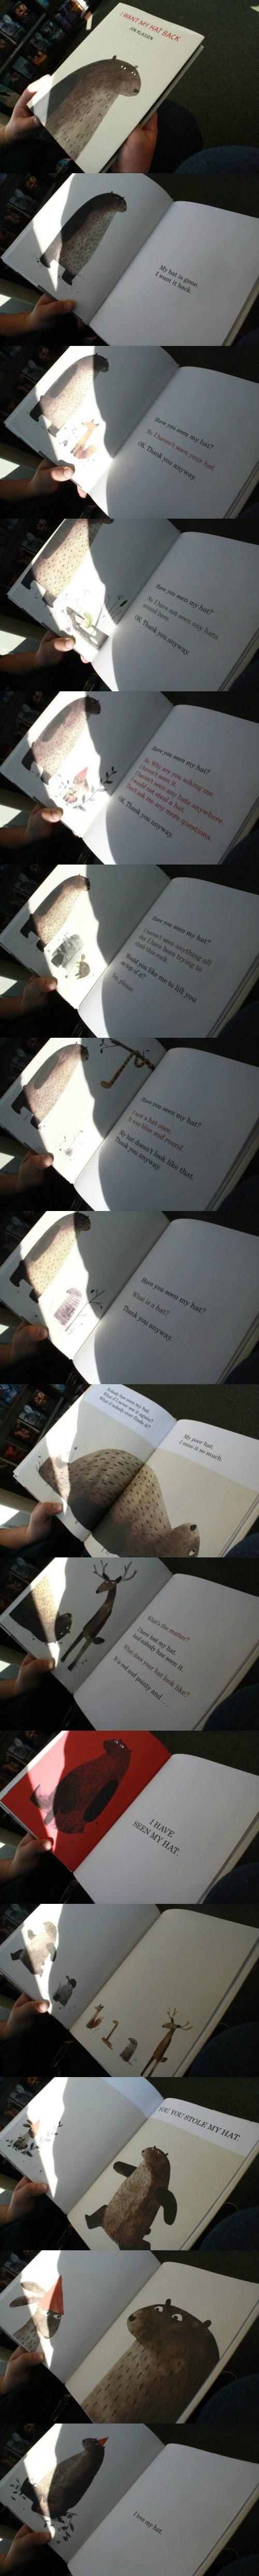 Best storybook ever